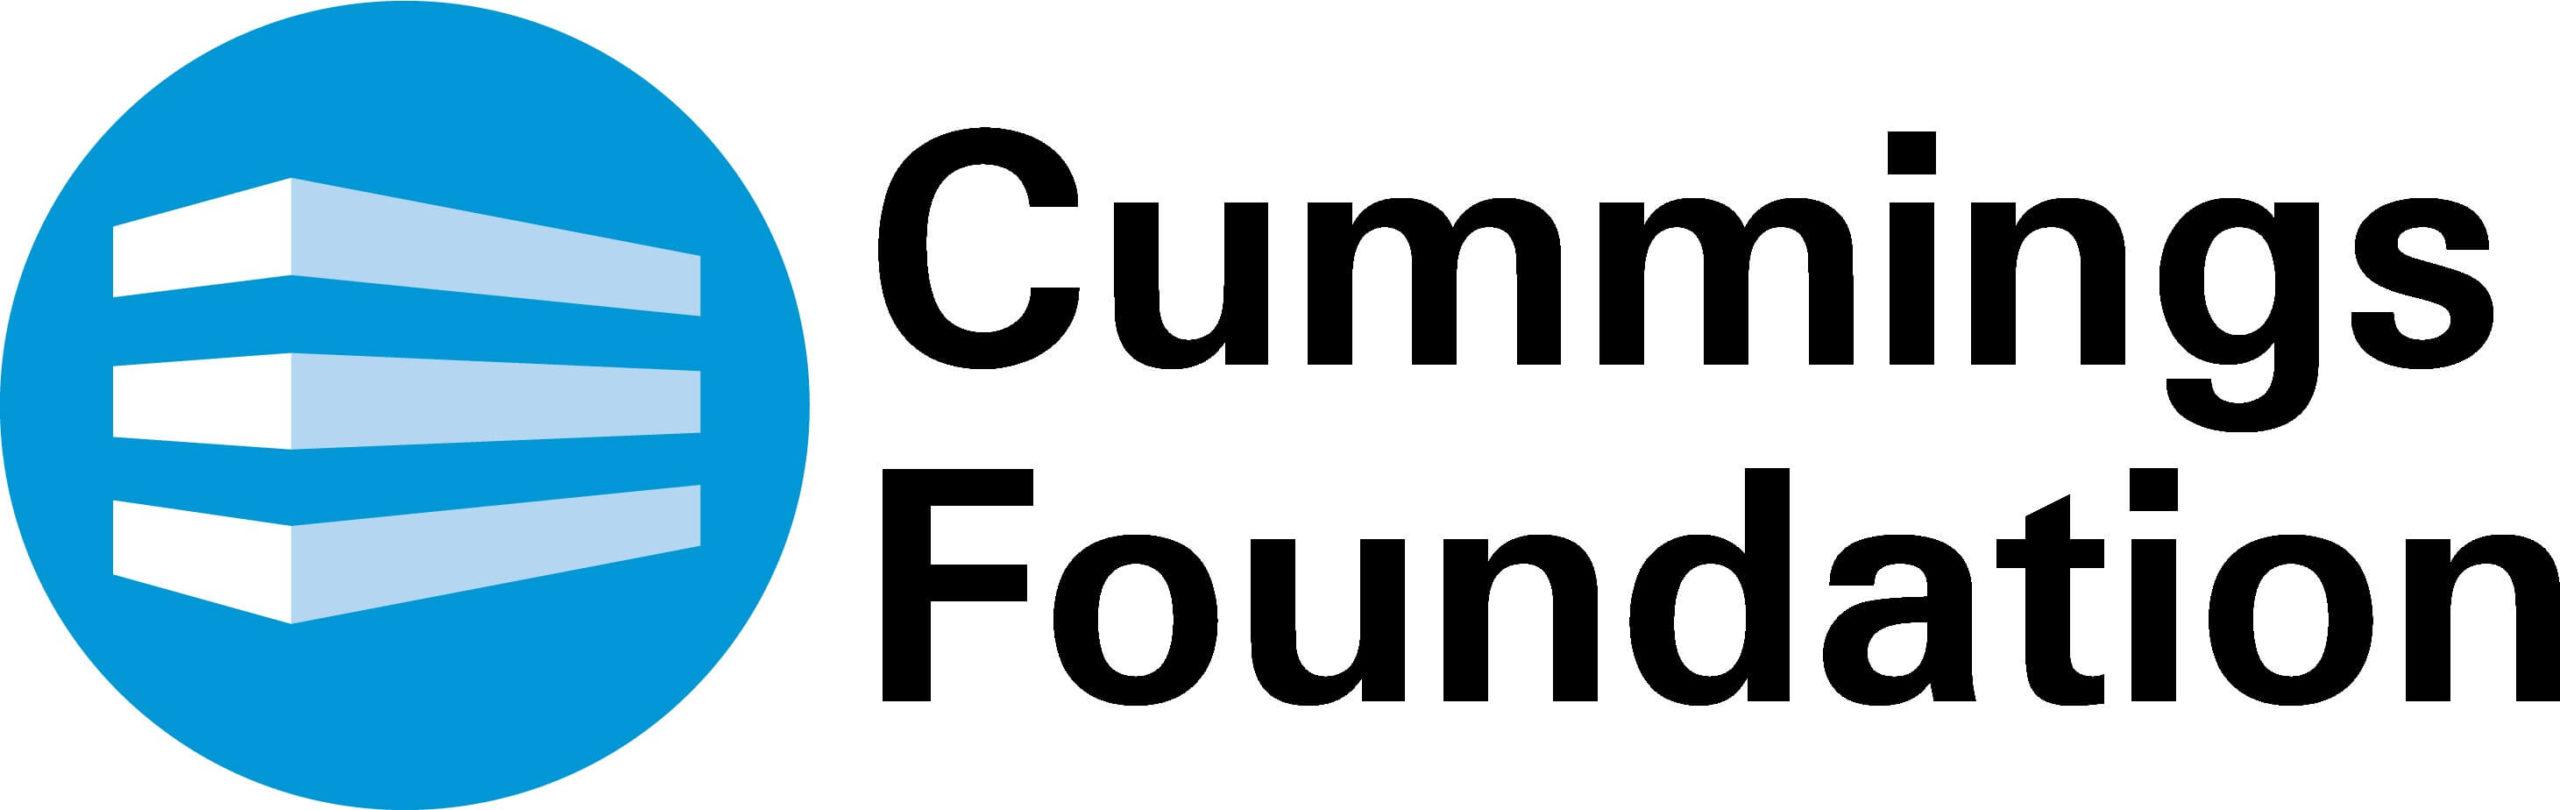 Cummings Foundation logo